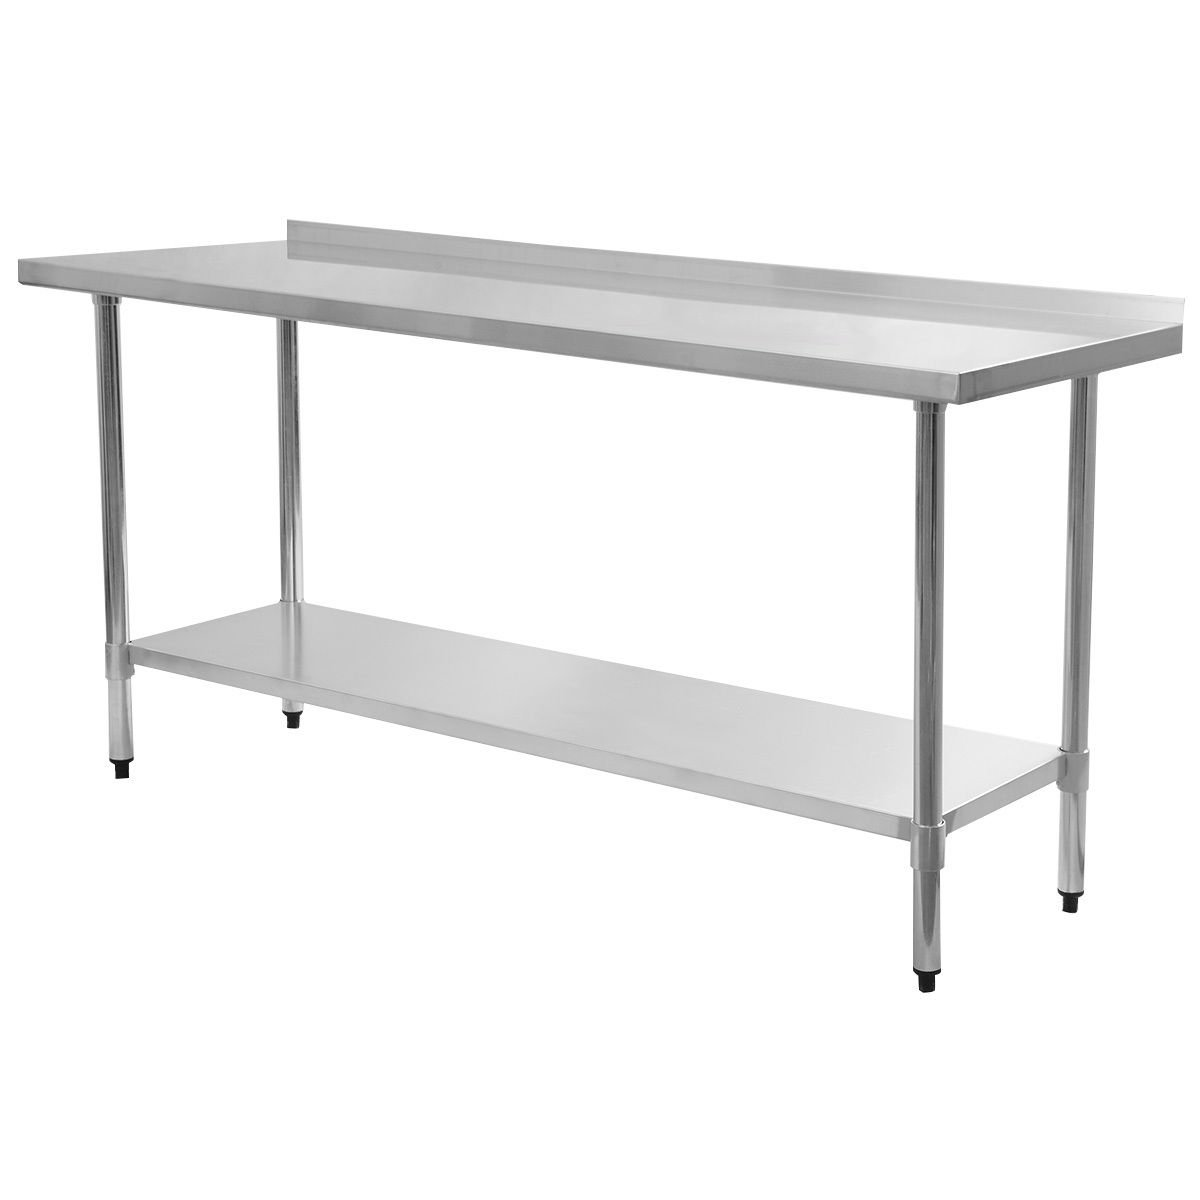 Giantex Stainless Steel Work Prep Table with Backsplash Kitchen Restaurant (24'' x 72'' )